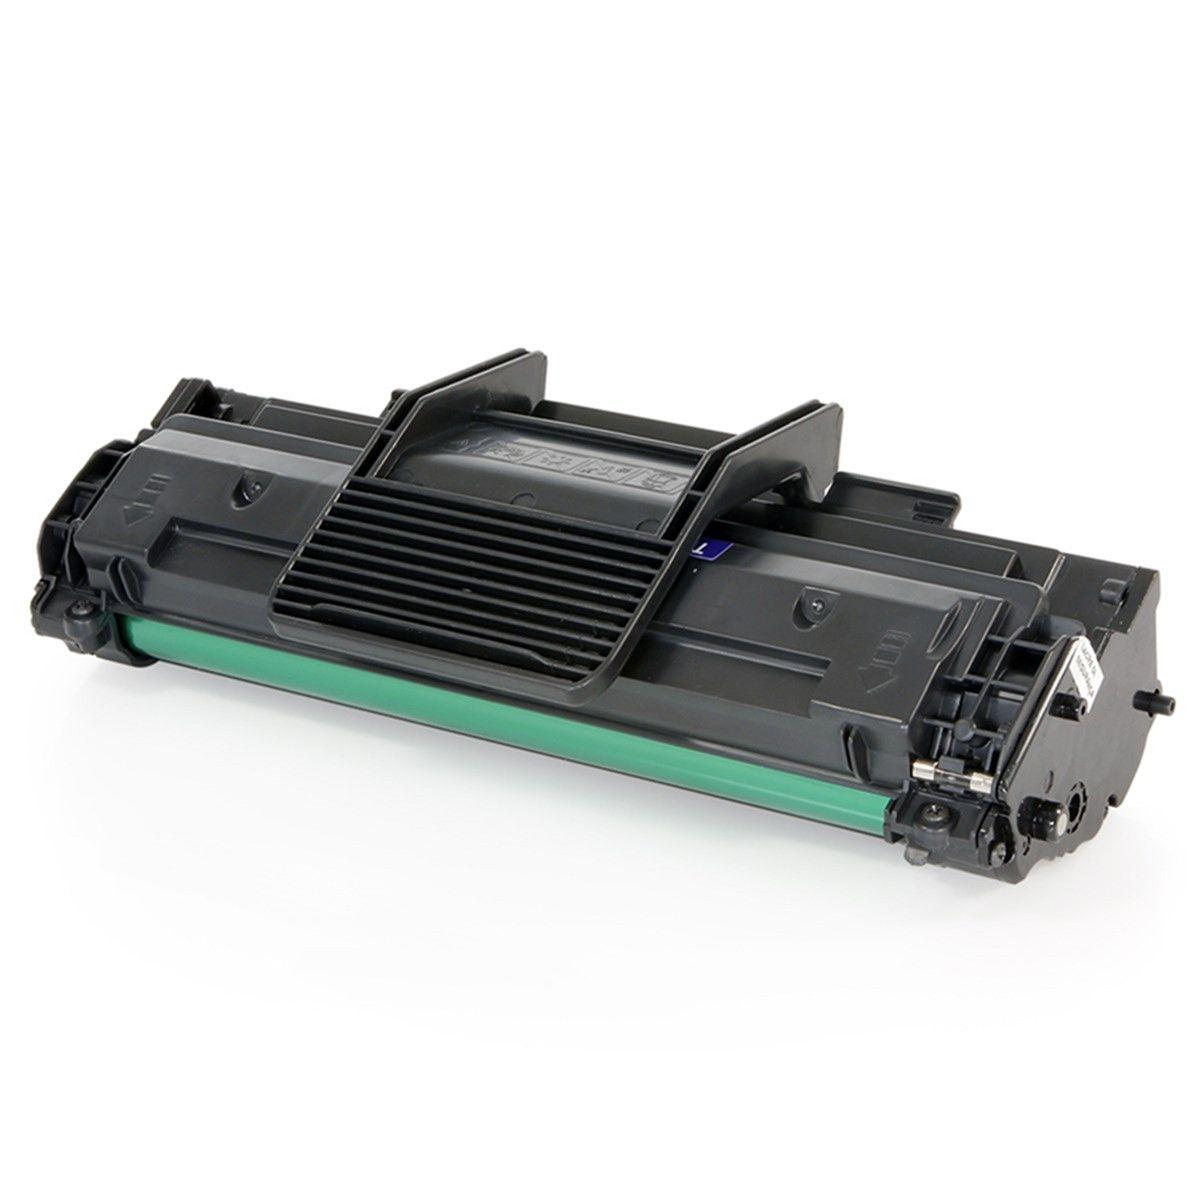 Toner compatível com SAMSUNG ML2571 ML-2571 ML2571N ML-2571N Black 3.000 Páginas - Cartucho & Cia